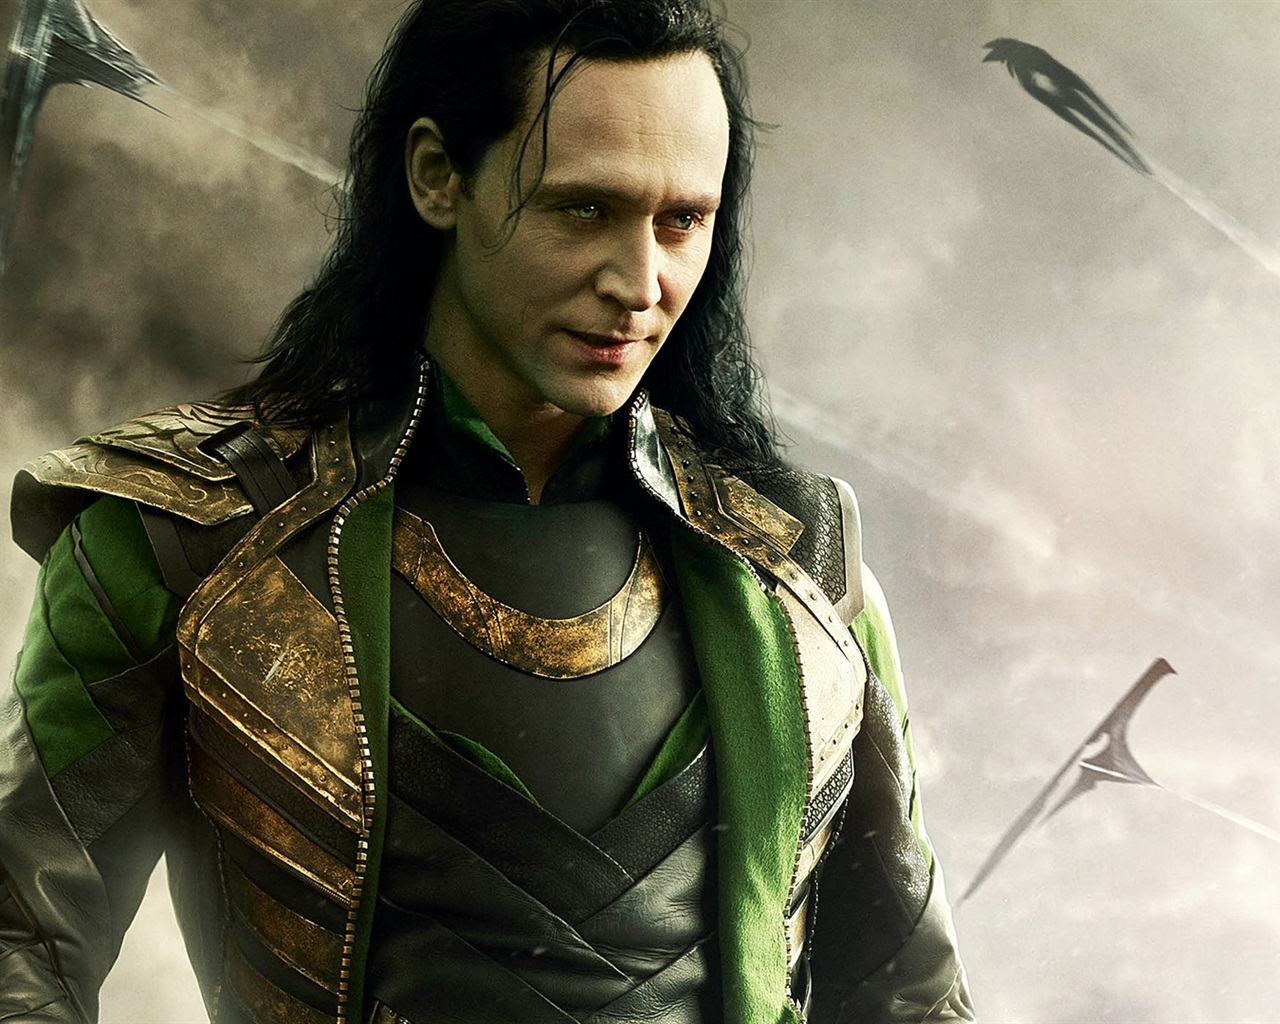 Thor The Dark World Tom Hiddleston Loki 640x960 Iphone 4